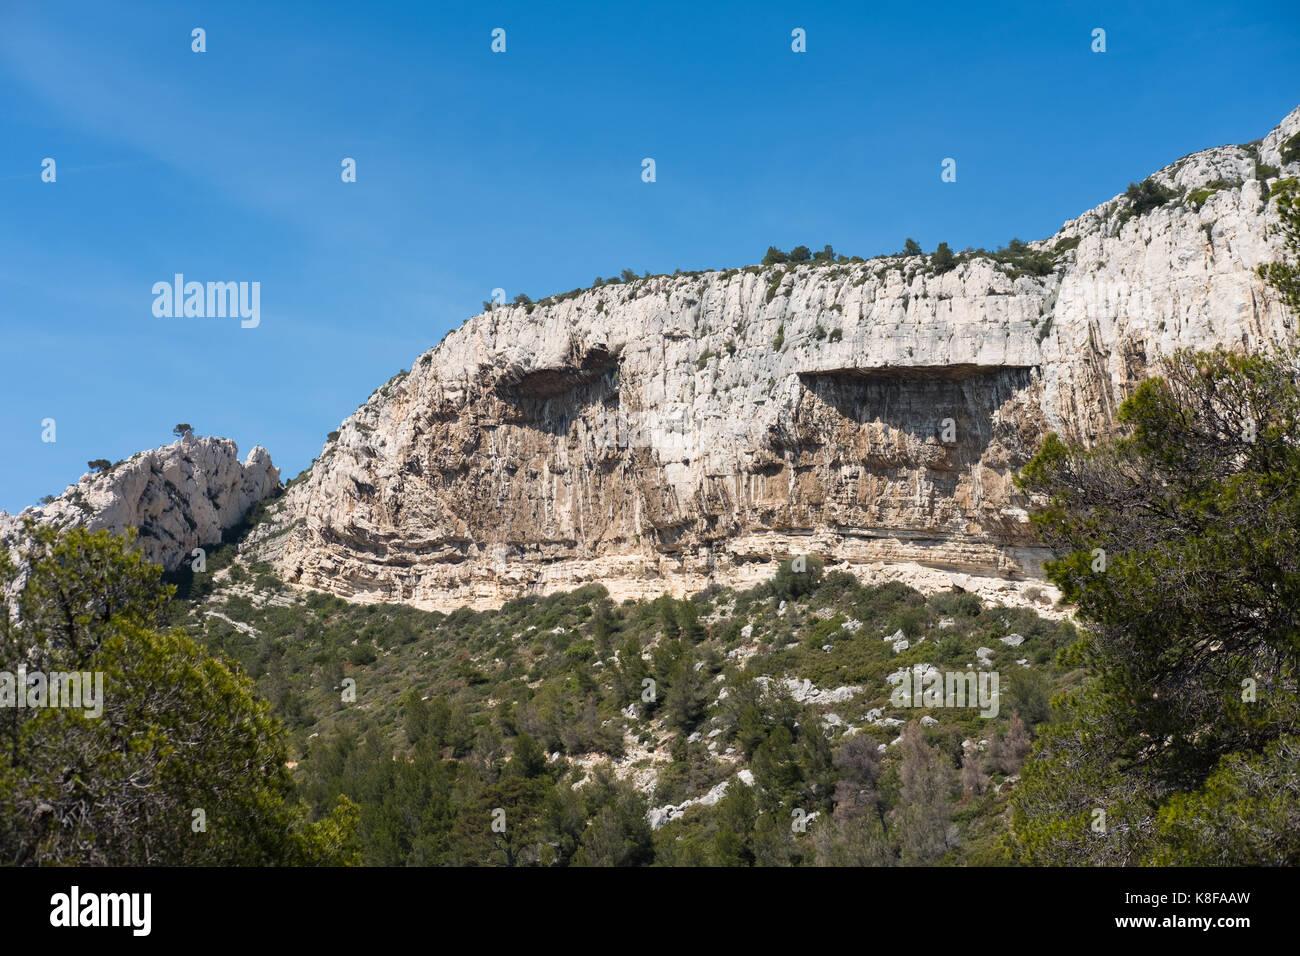 Calanque de Sugiton,Calanques National Park, southern France Stock Photo